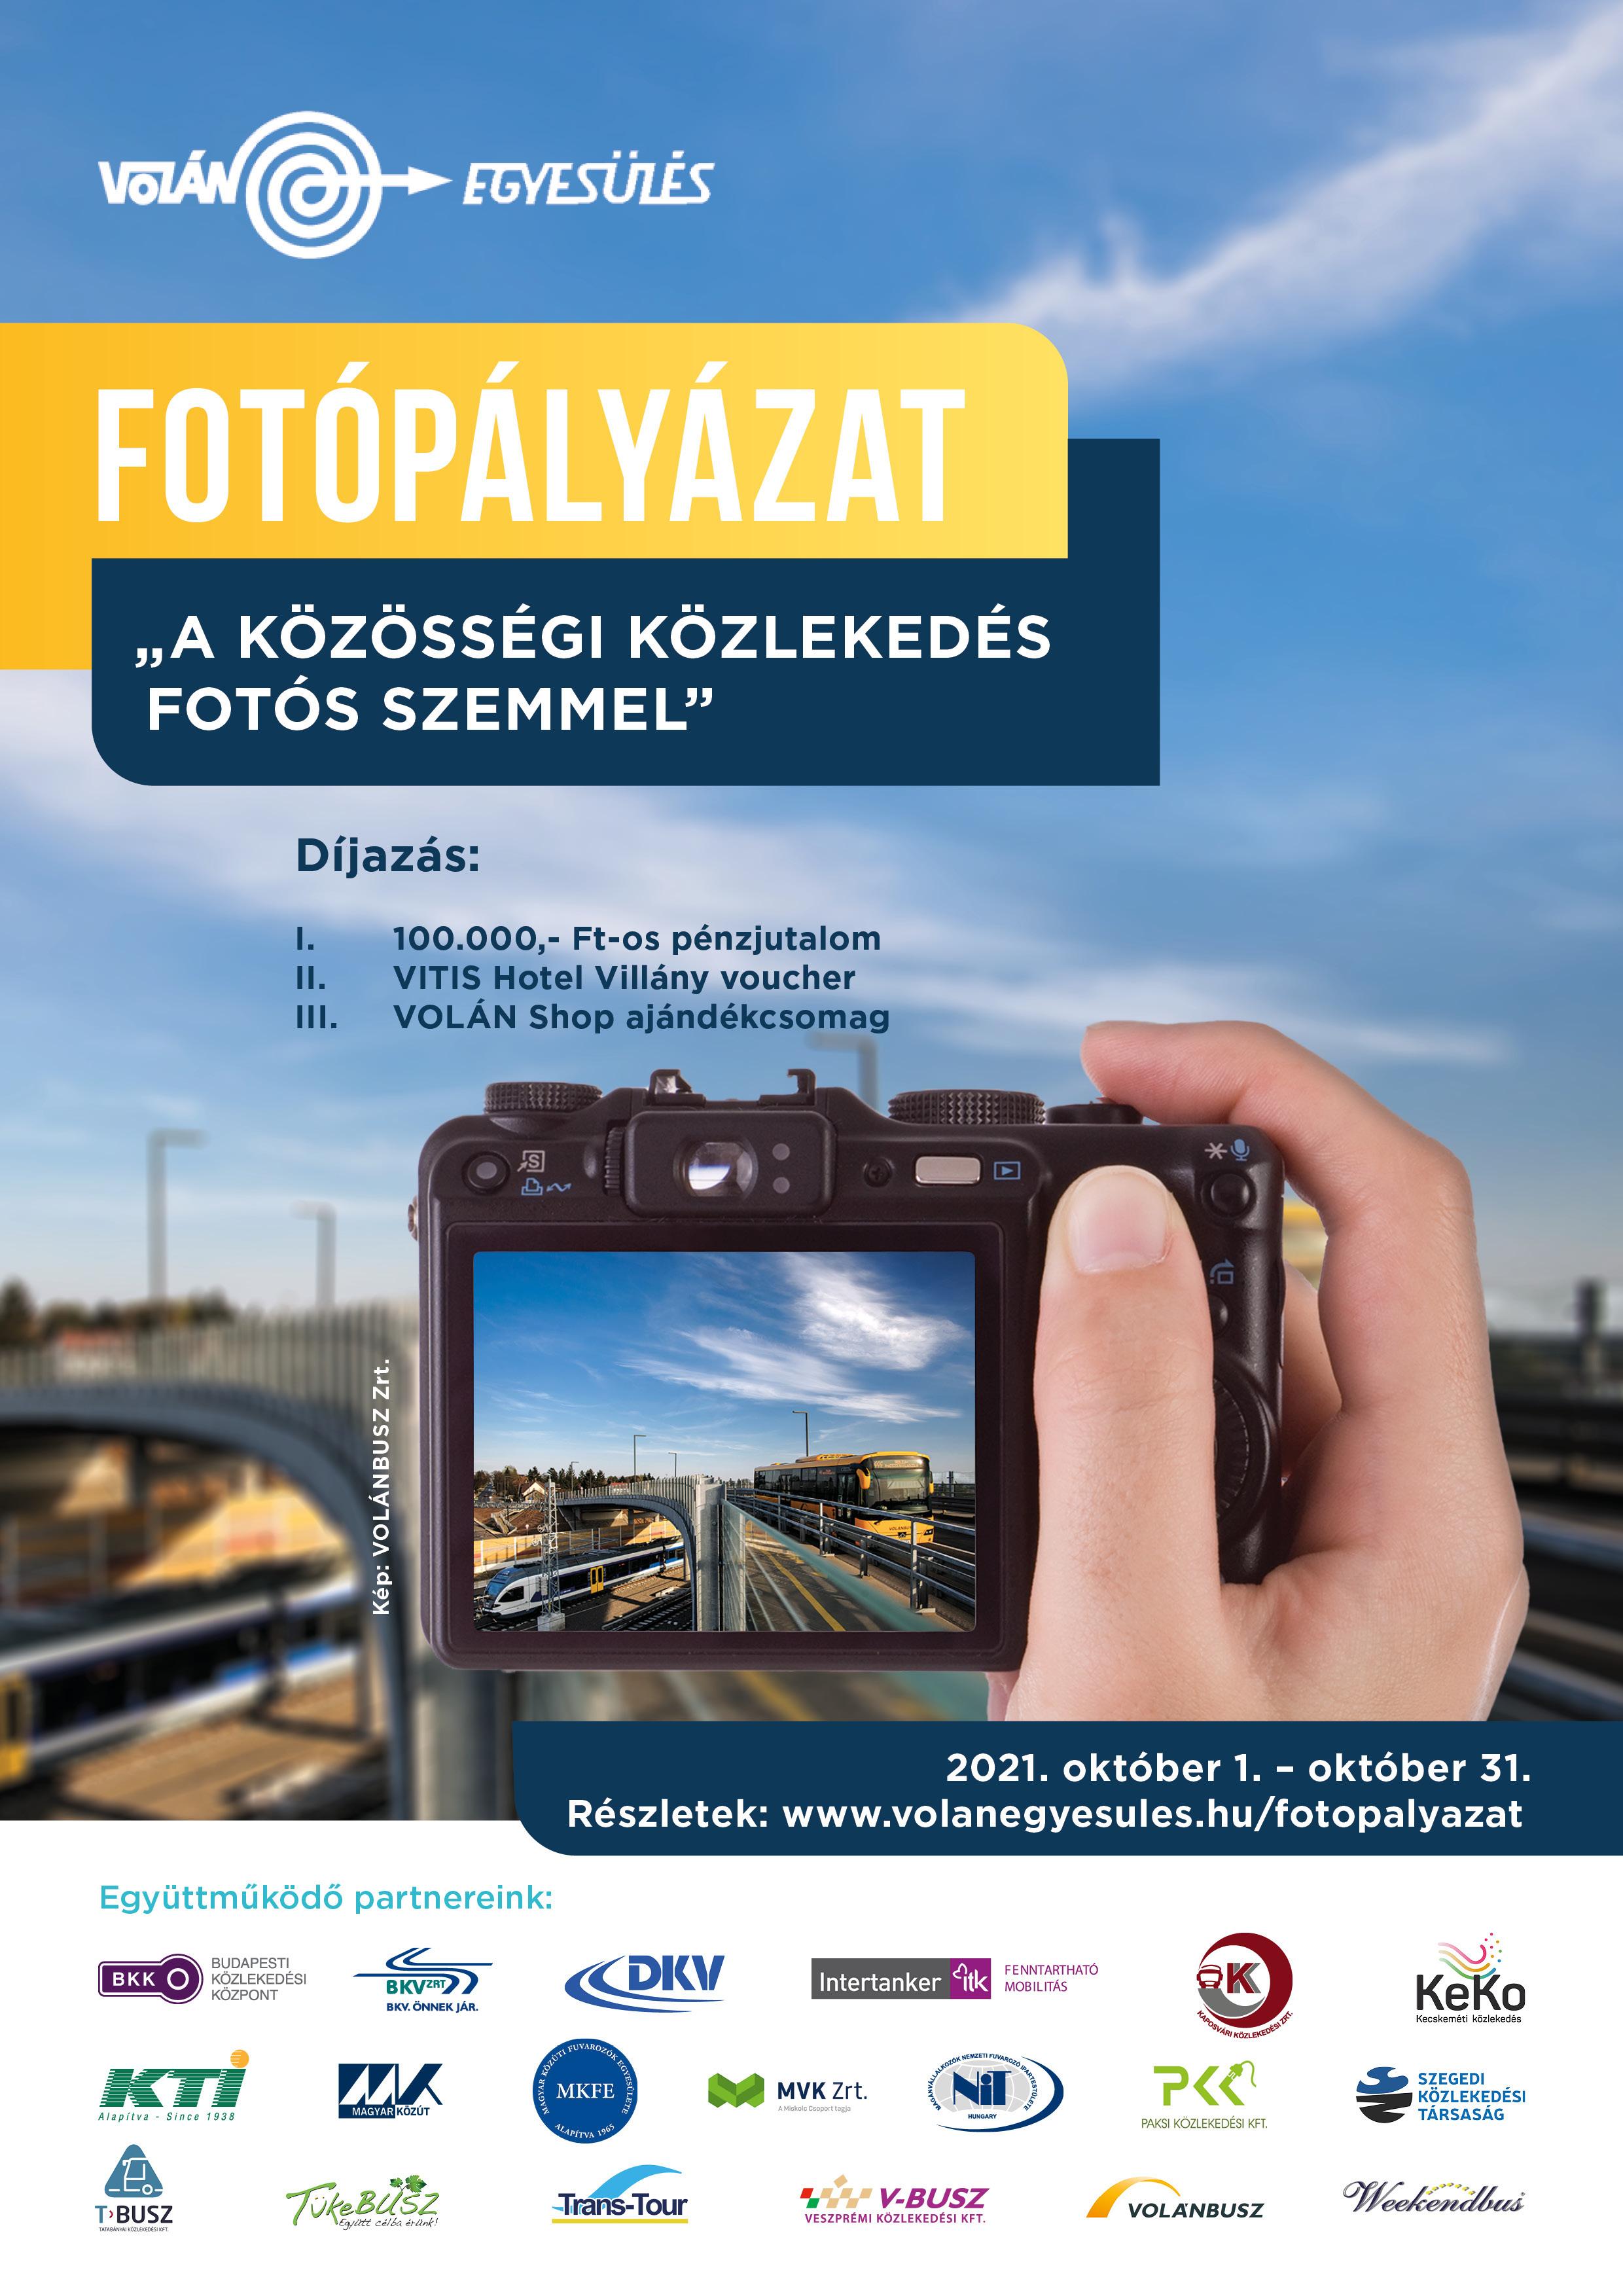 Volan_fotopalyazat